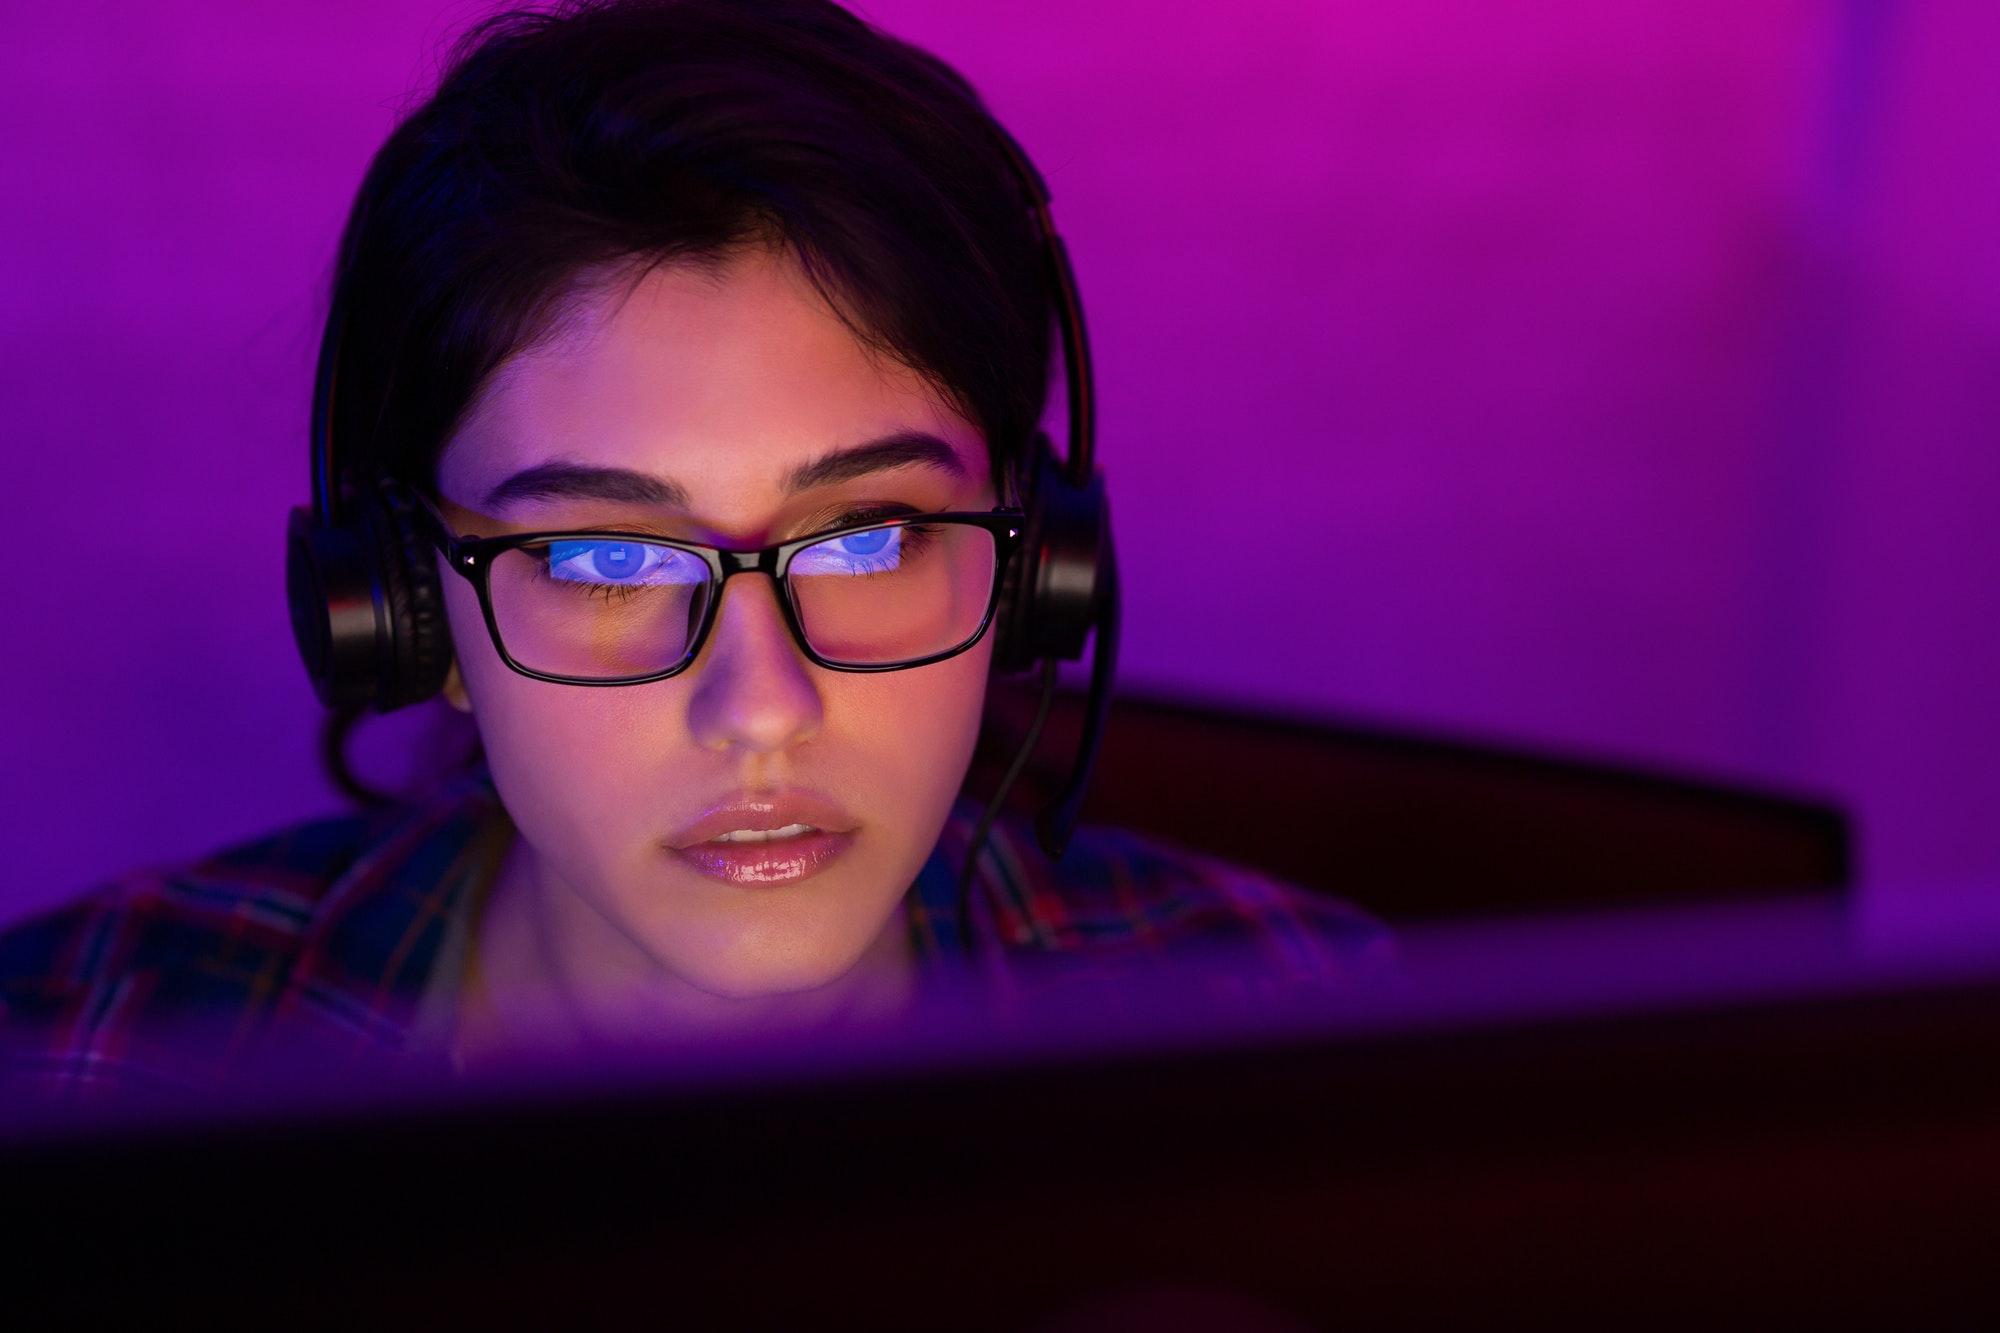 Female gamer in eyeglasses streaming online playthrough video